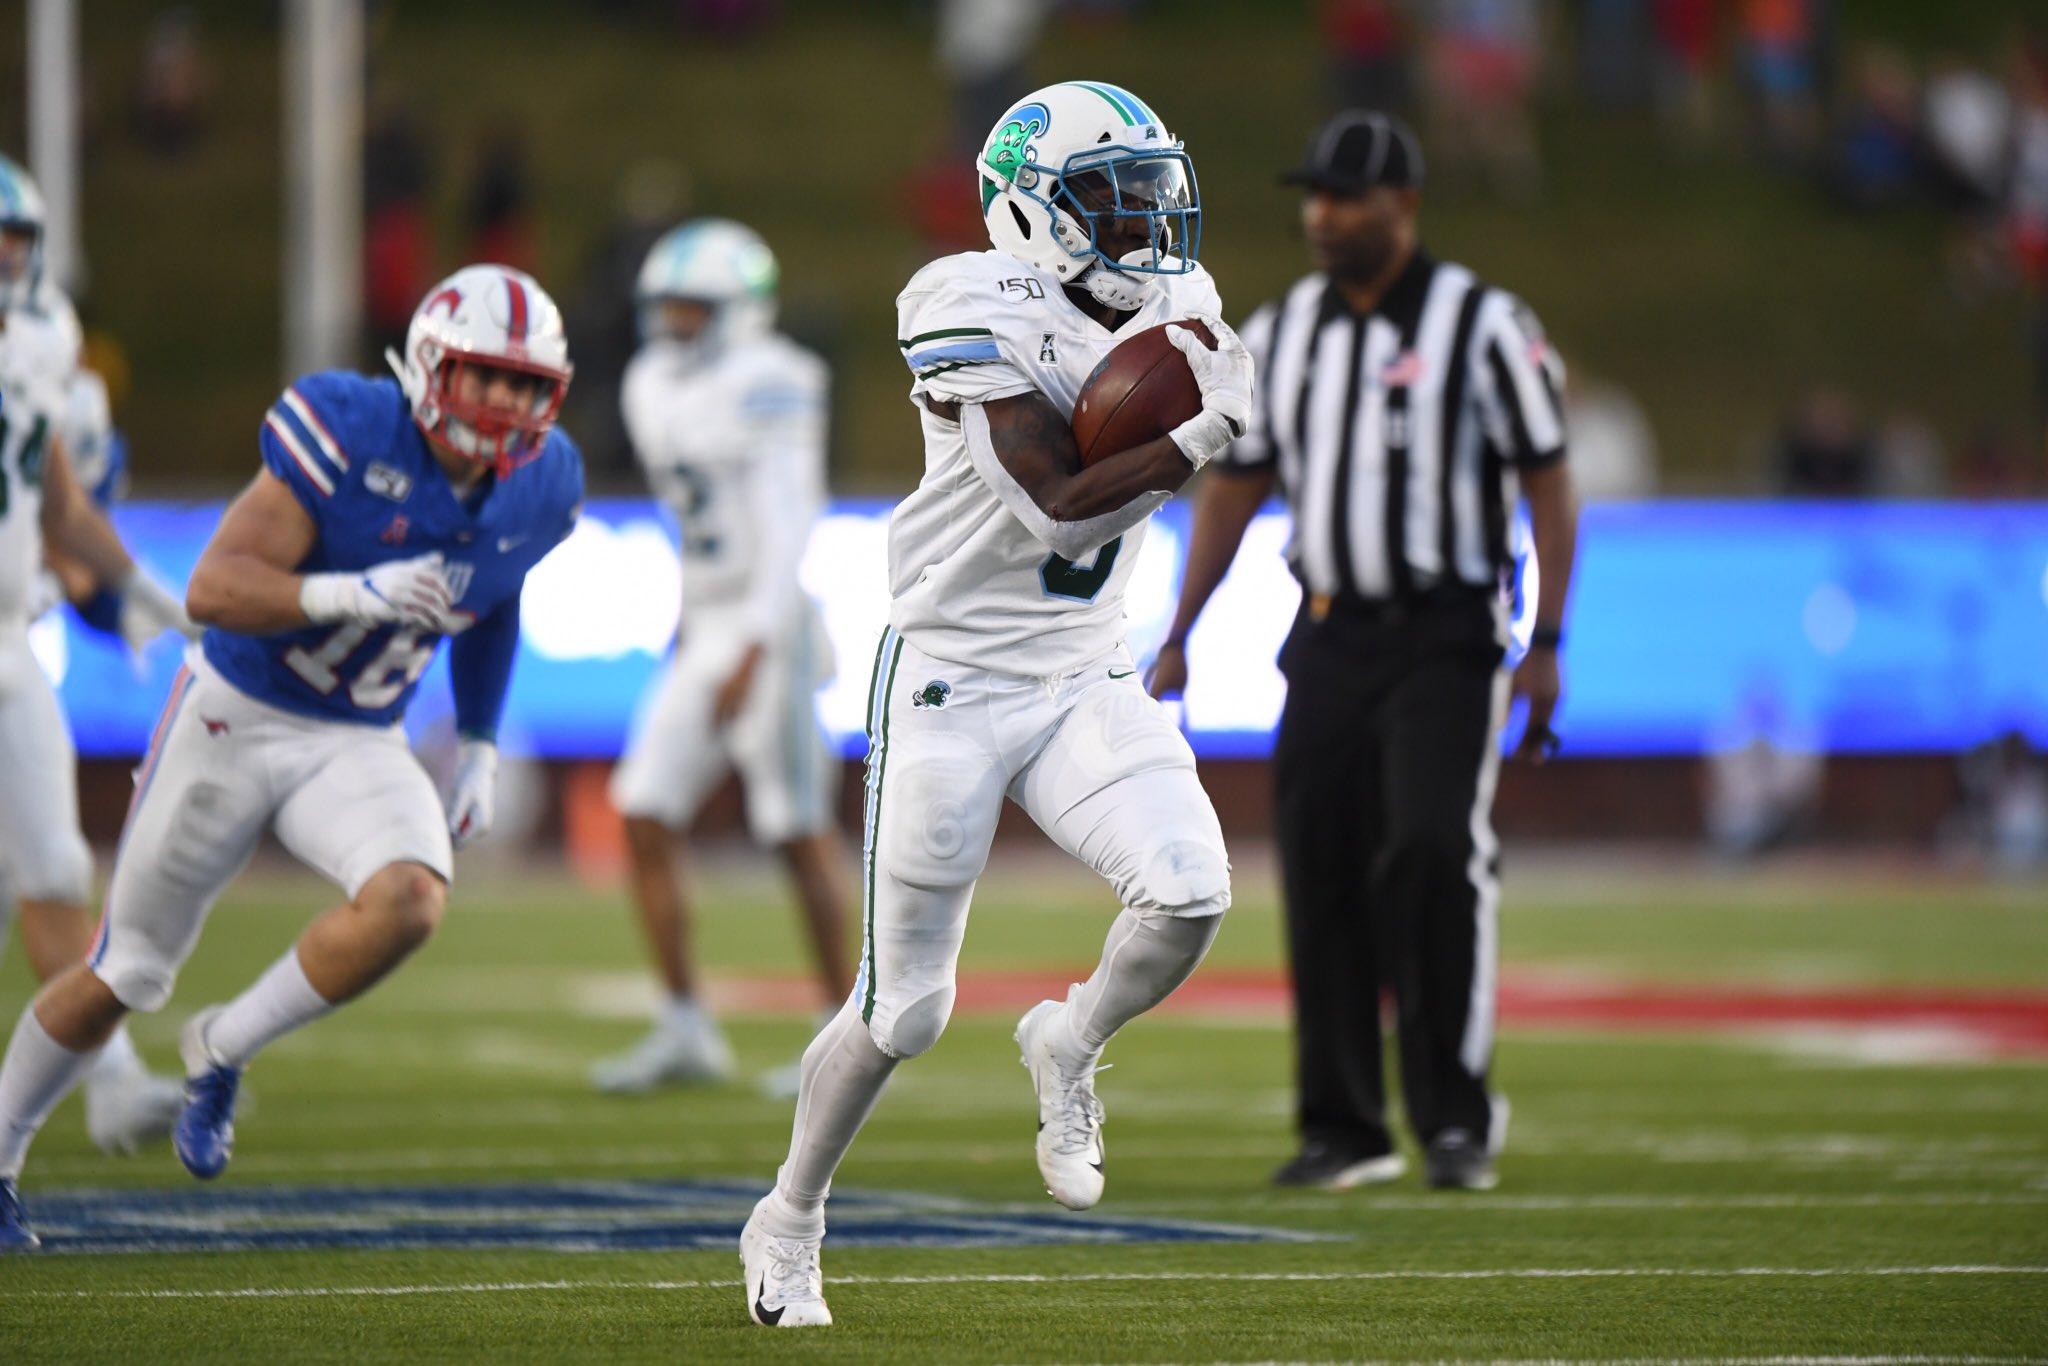 Tulane Football 2020 Recruiting Analysis